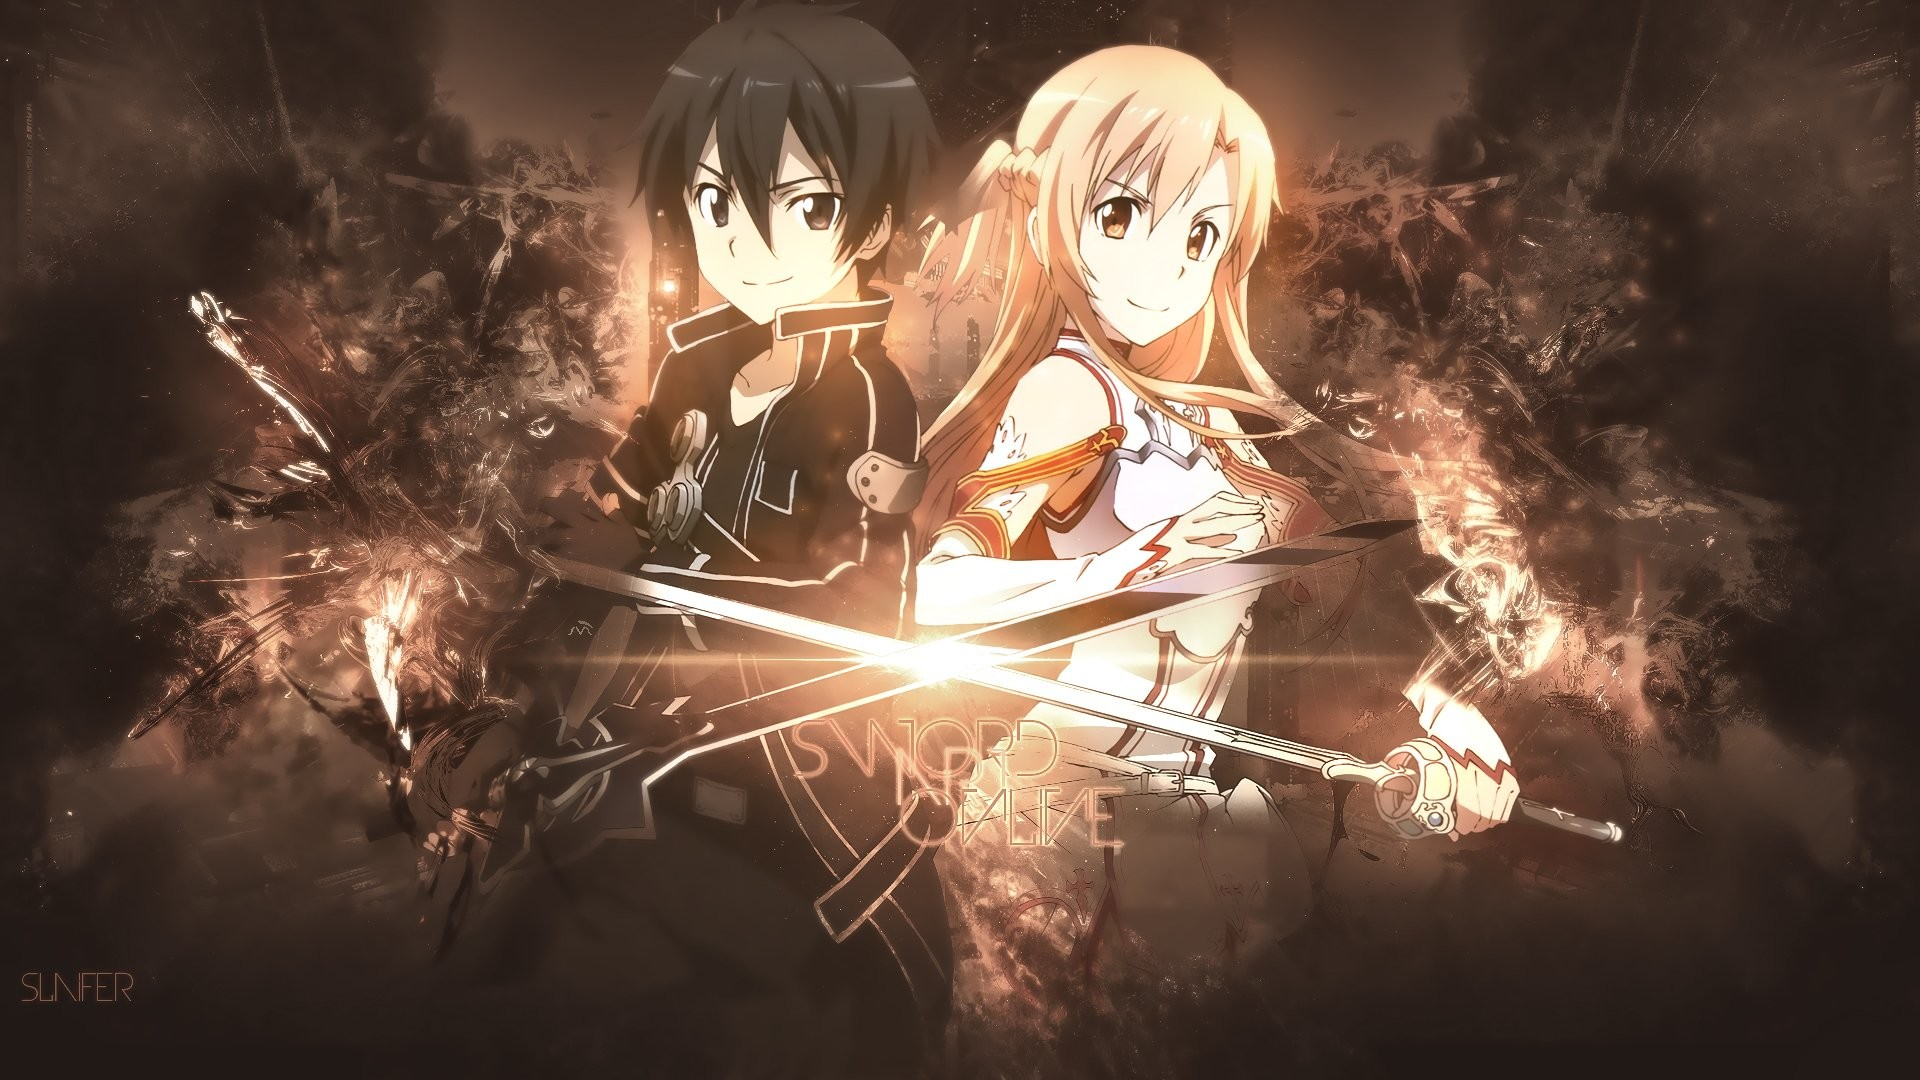 Sword Art Online Wallpaper Download Free Cool High Resolution